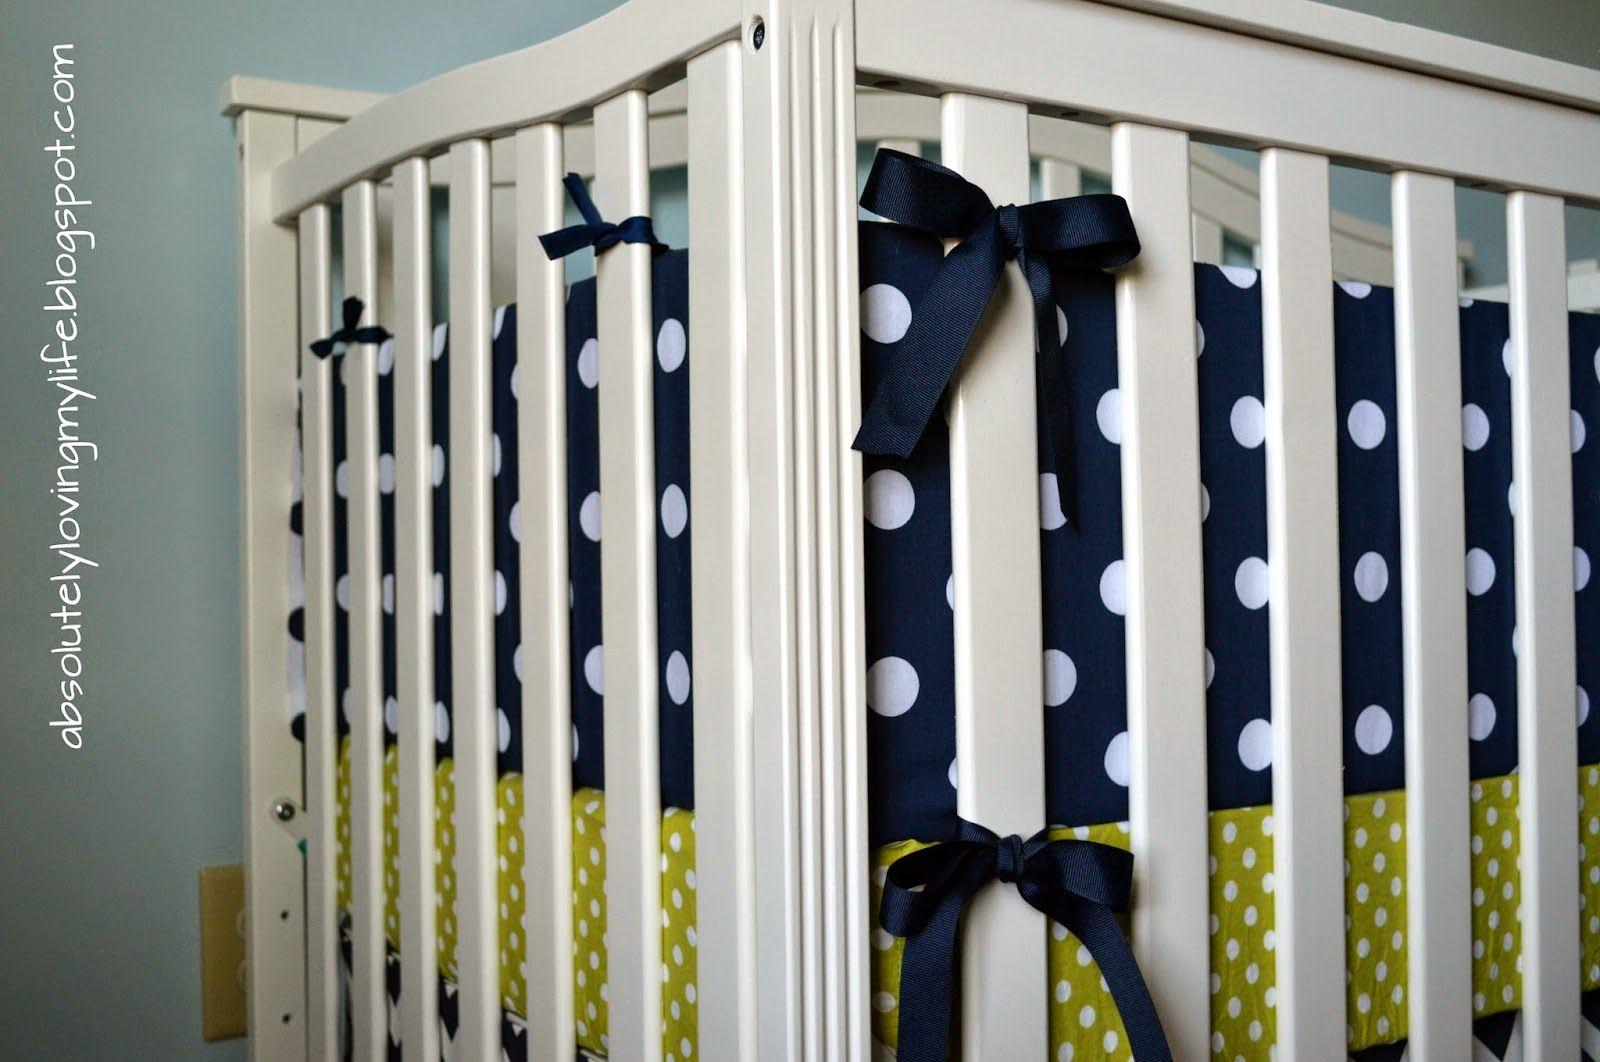 DIY No Sew Crib Bumper (With images) | Crib bumper, Baby ...